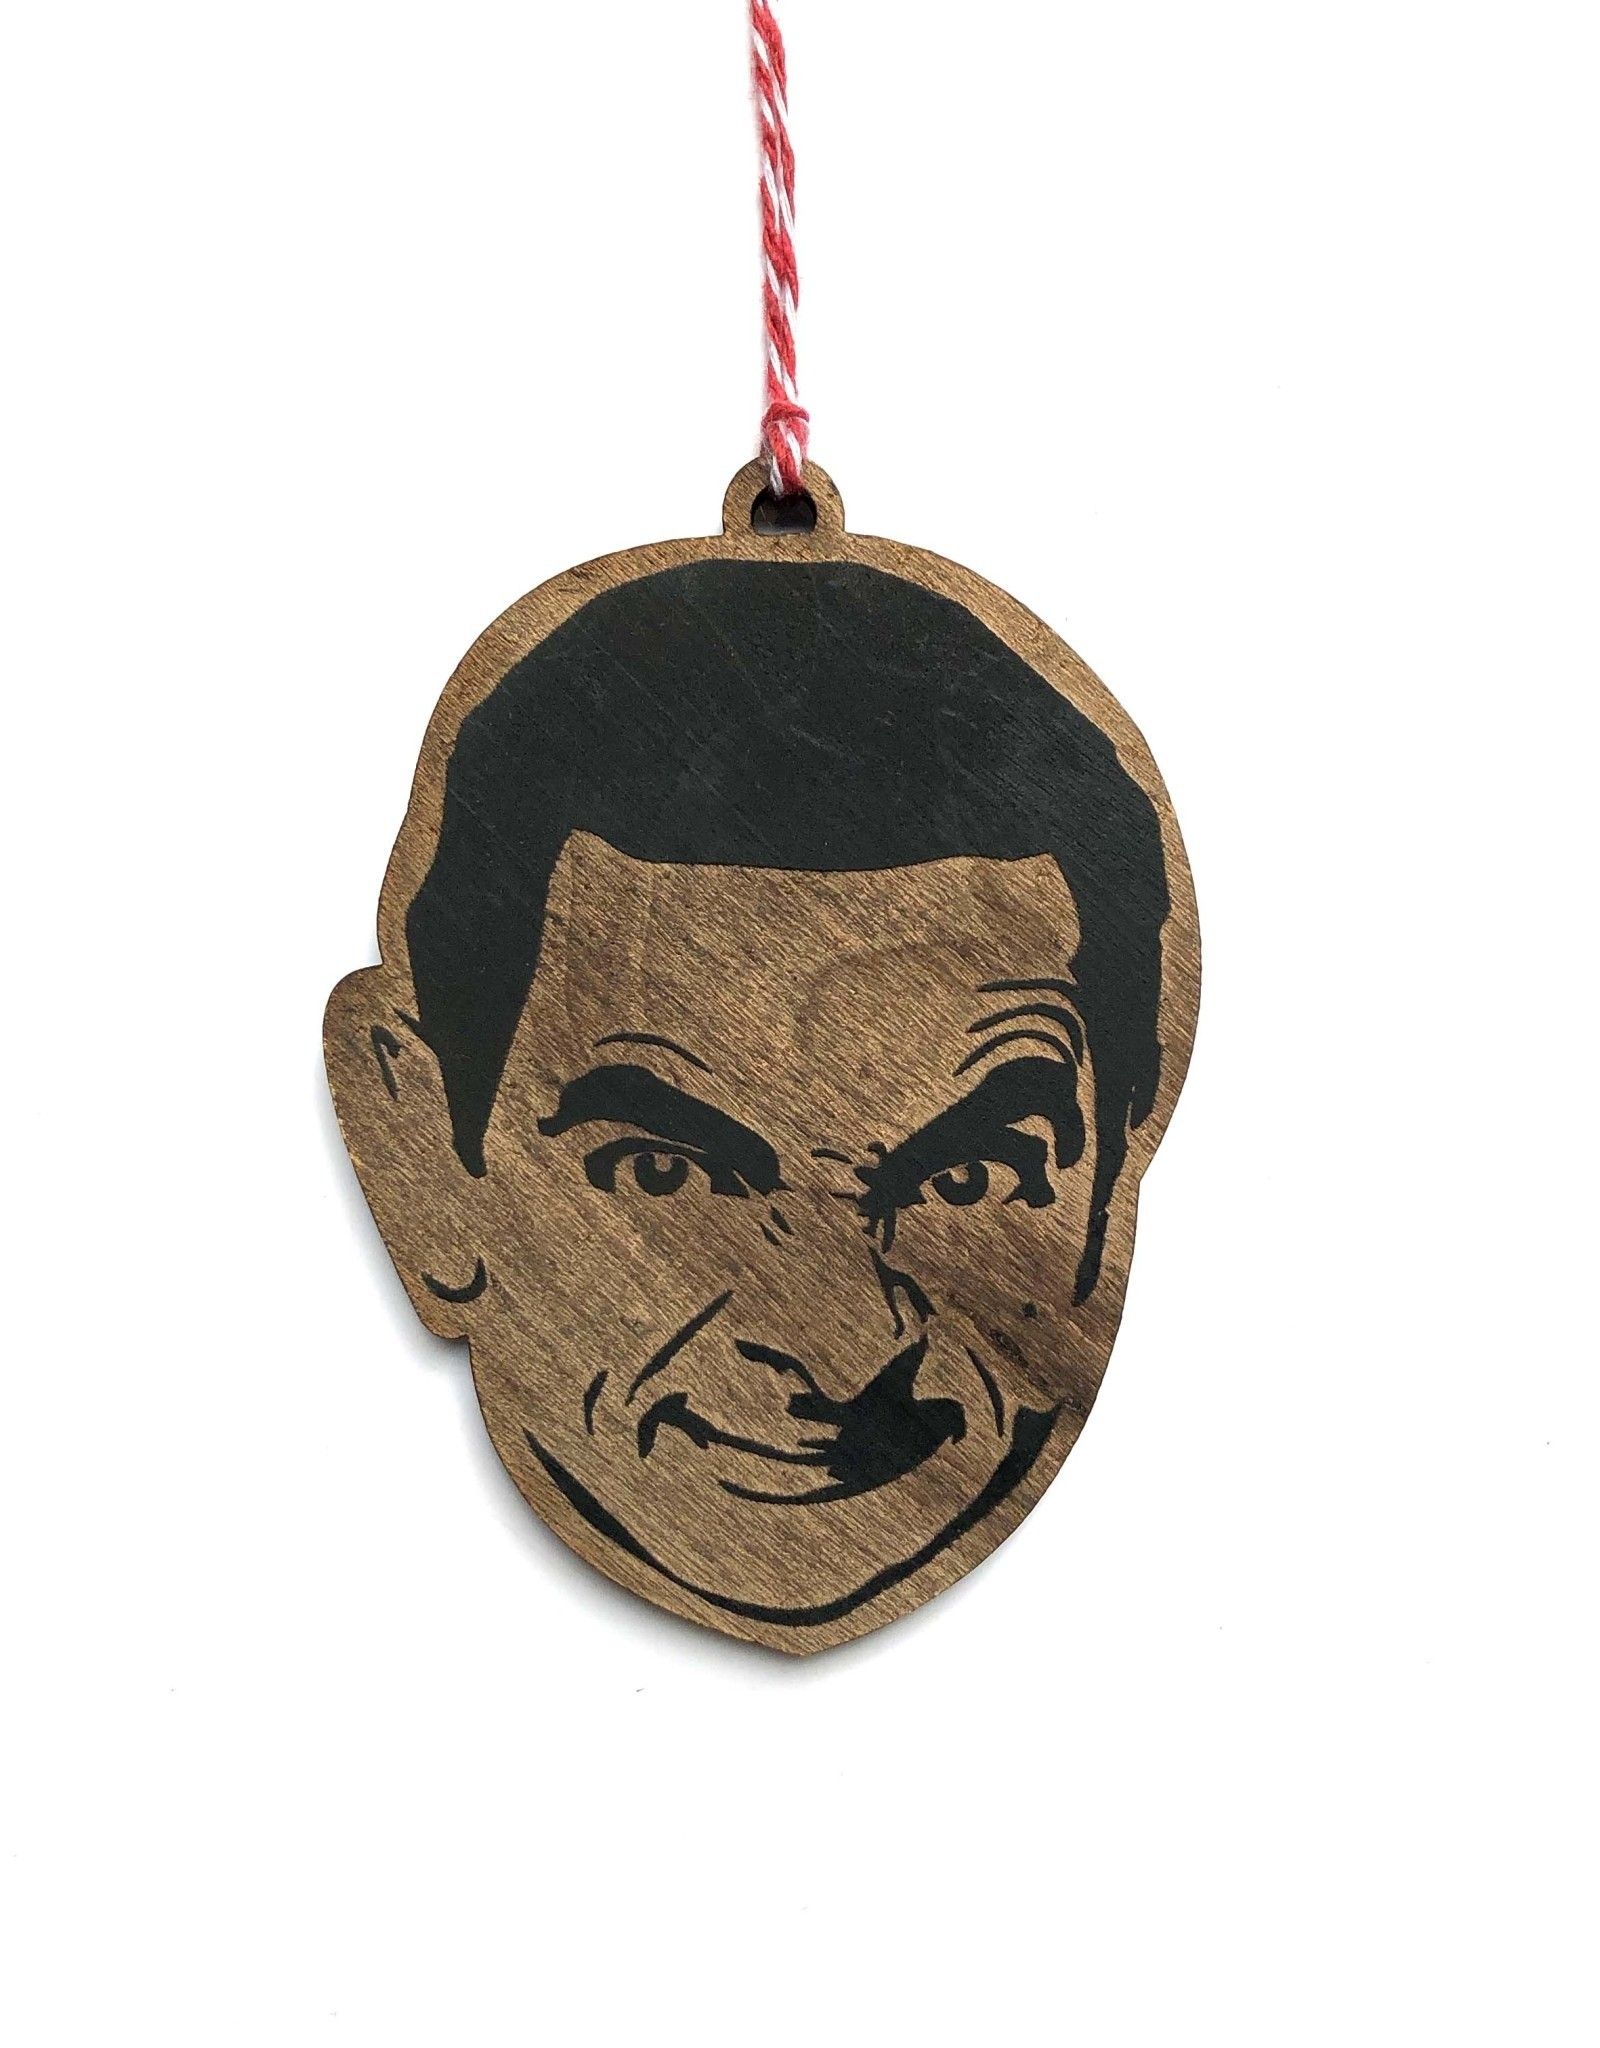 Mr. Bean Wooden Ornament